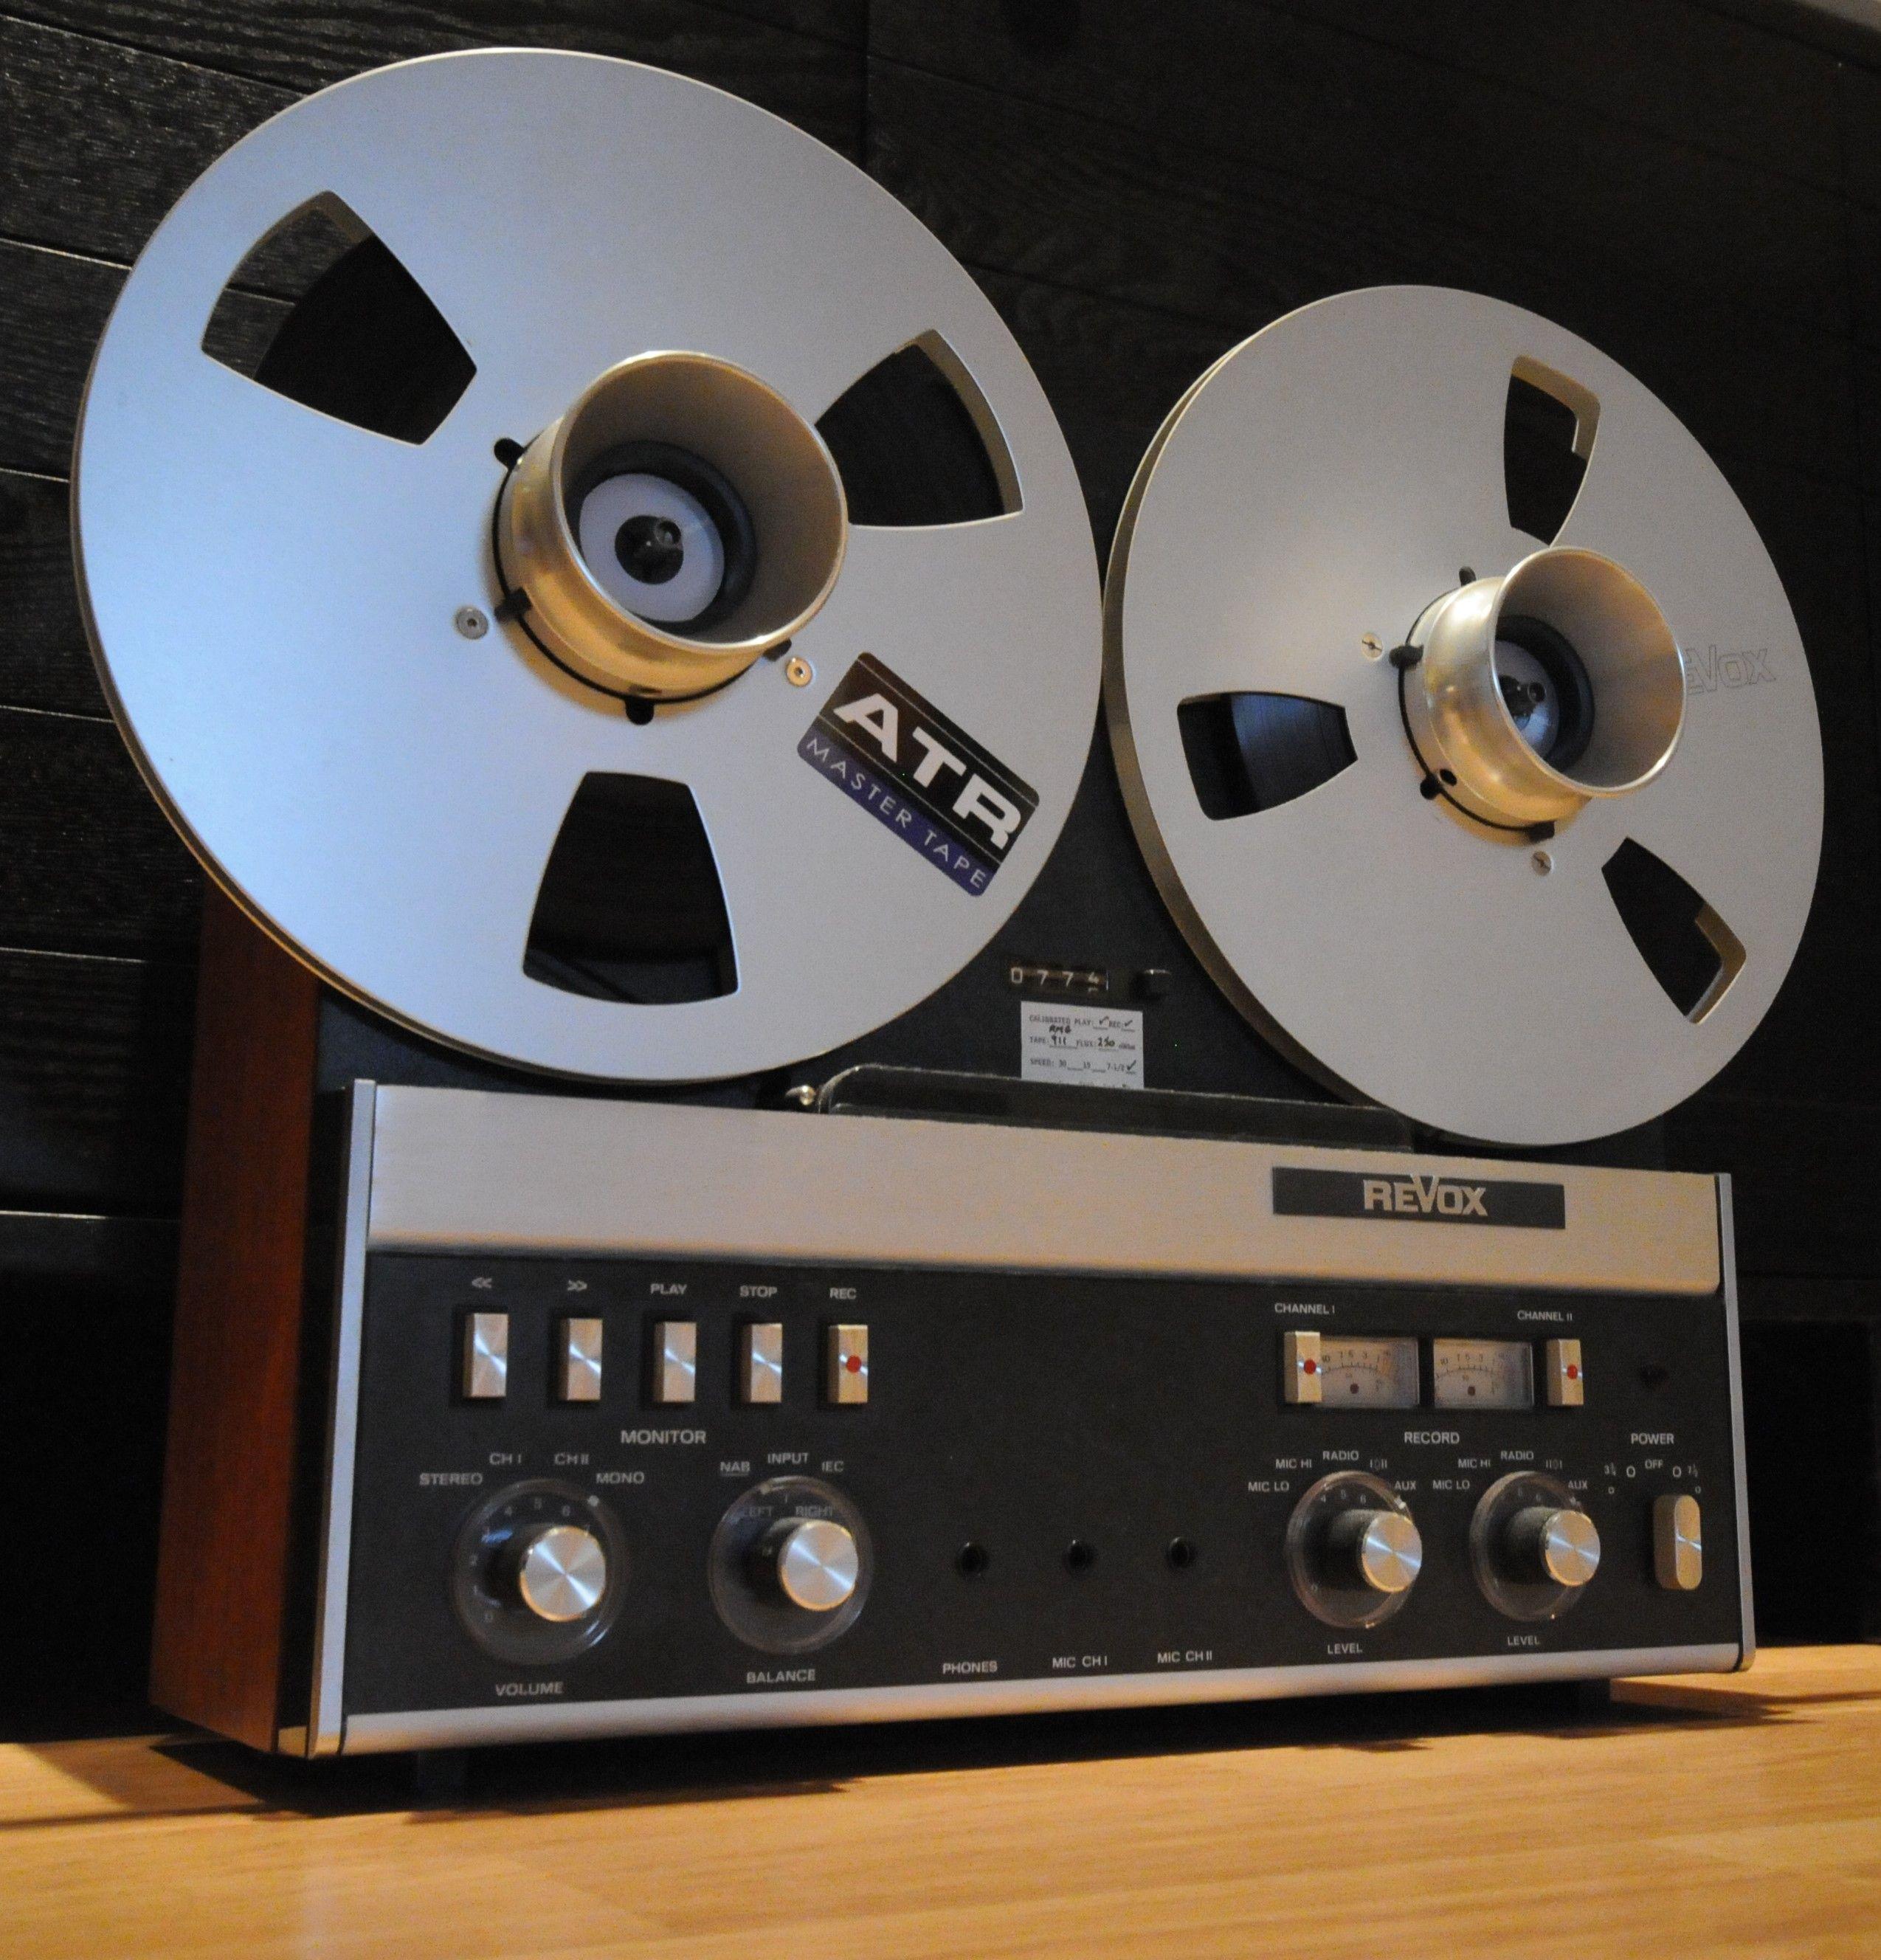 Revox A77 Reel To Reel Tape Deck In 2019 Tape Recorder